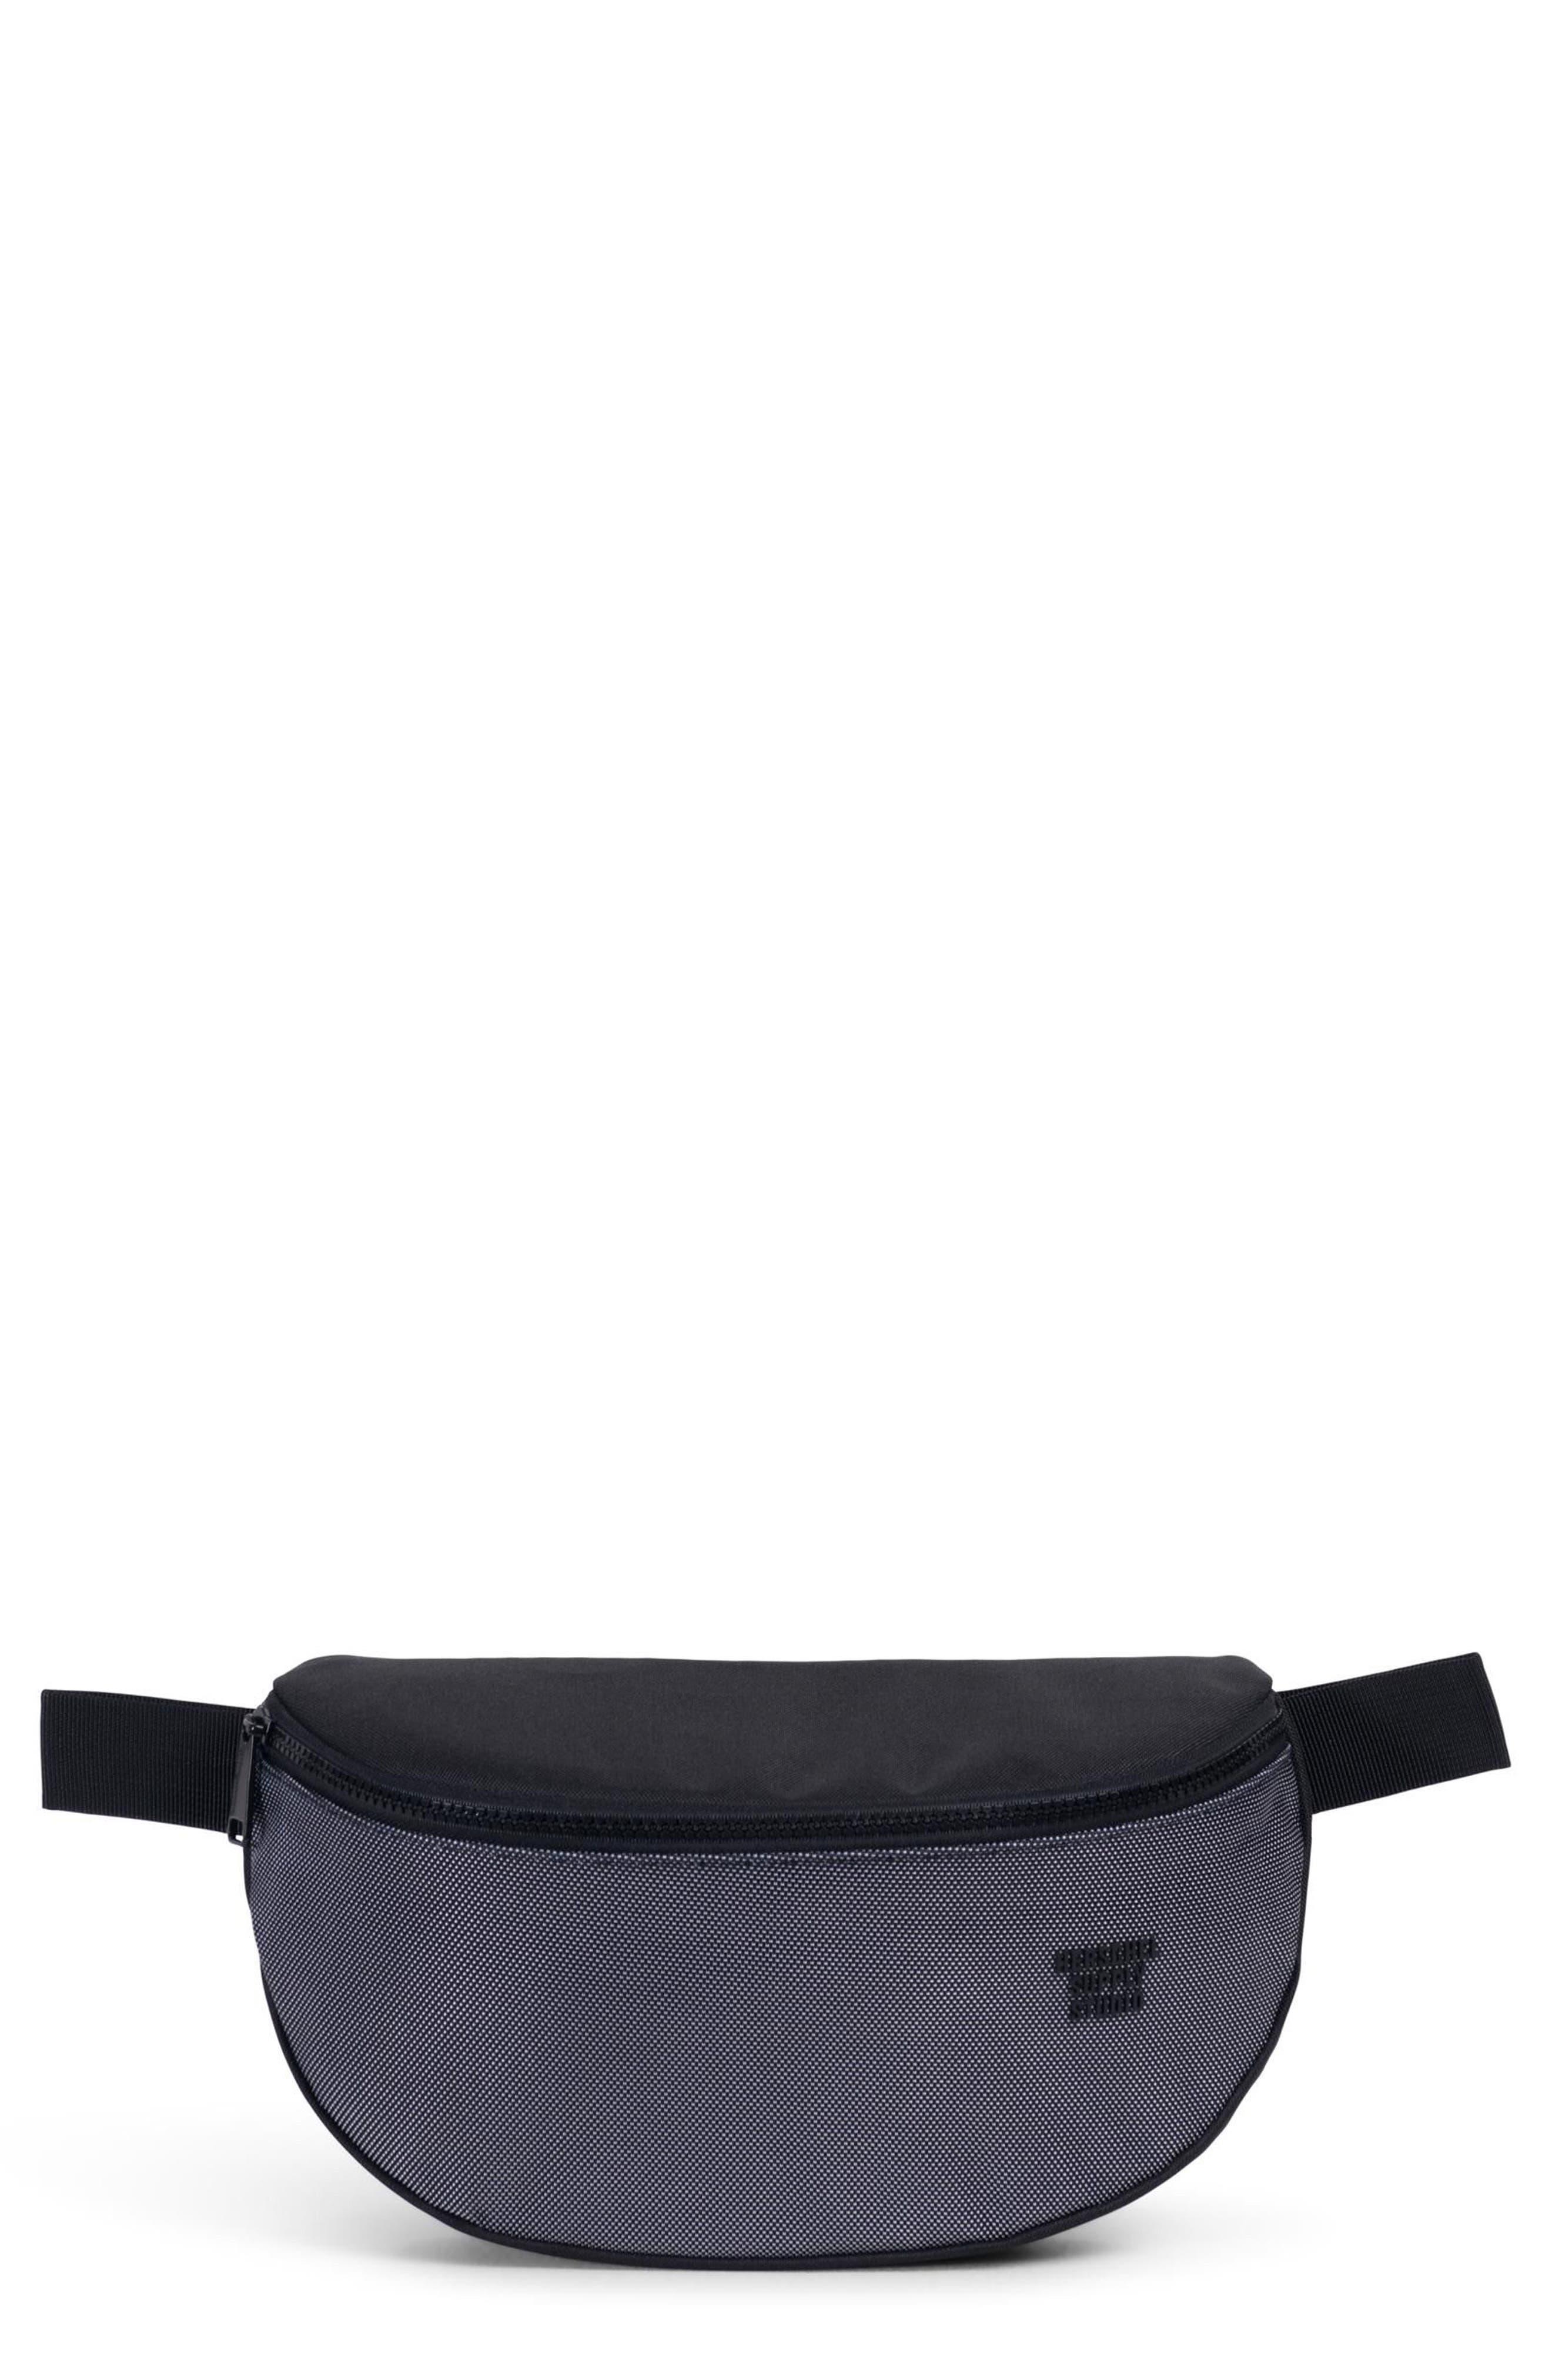 Sixteen Studio Belt Bag,                         Main,                         color, BLACK